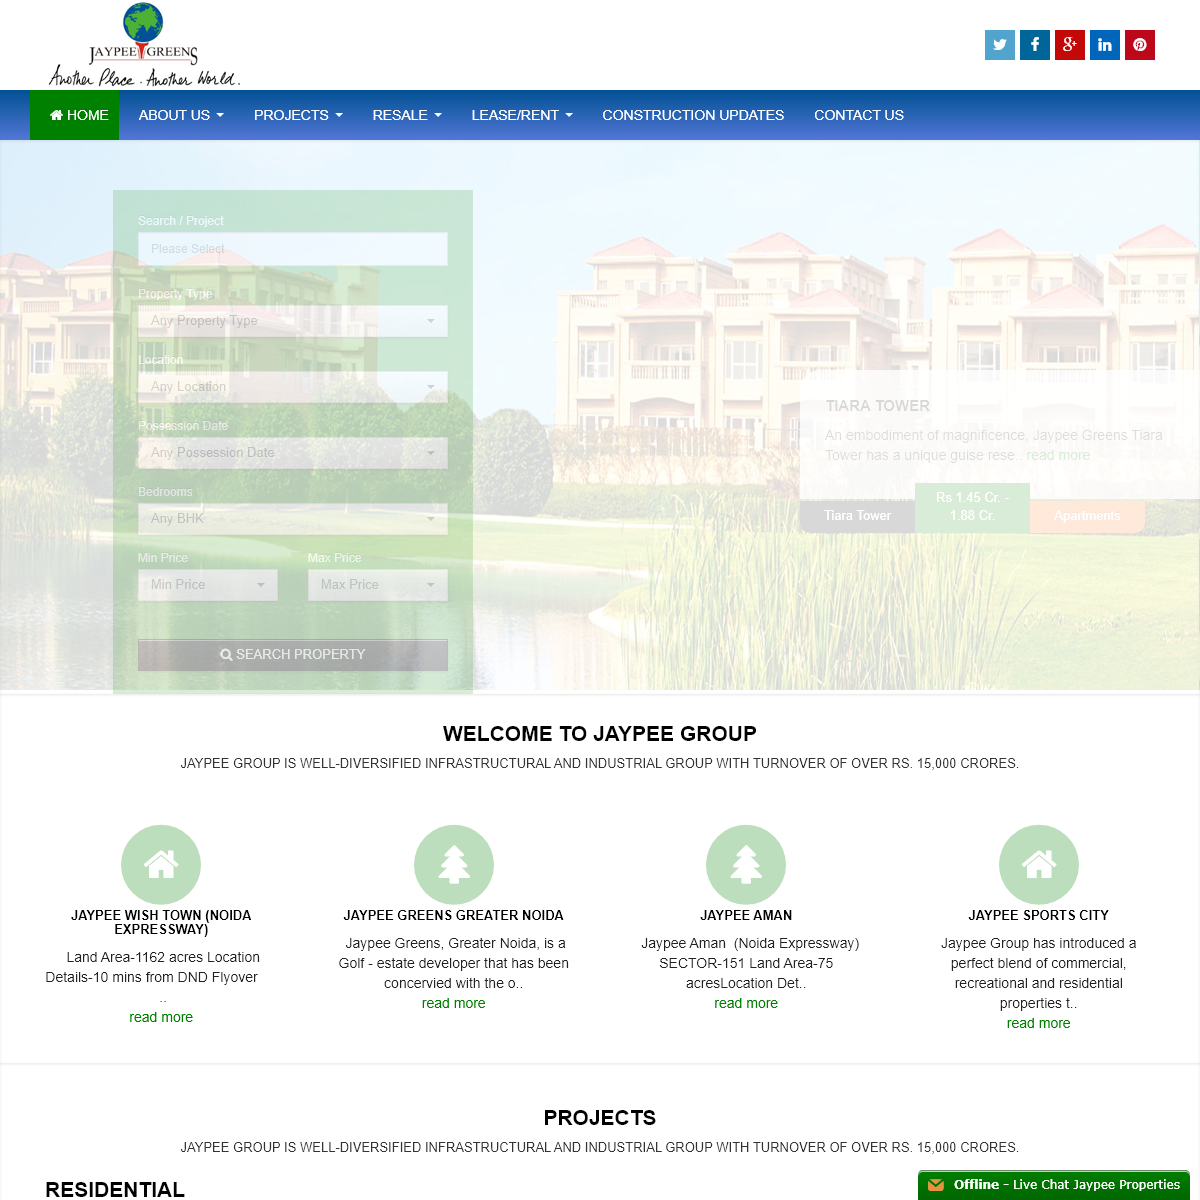 Jaypee properties Noida, Jaypee Residential projects Noida, Jaypee resale flats